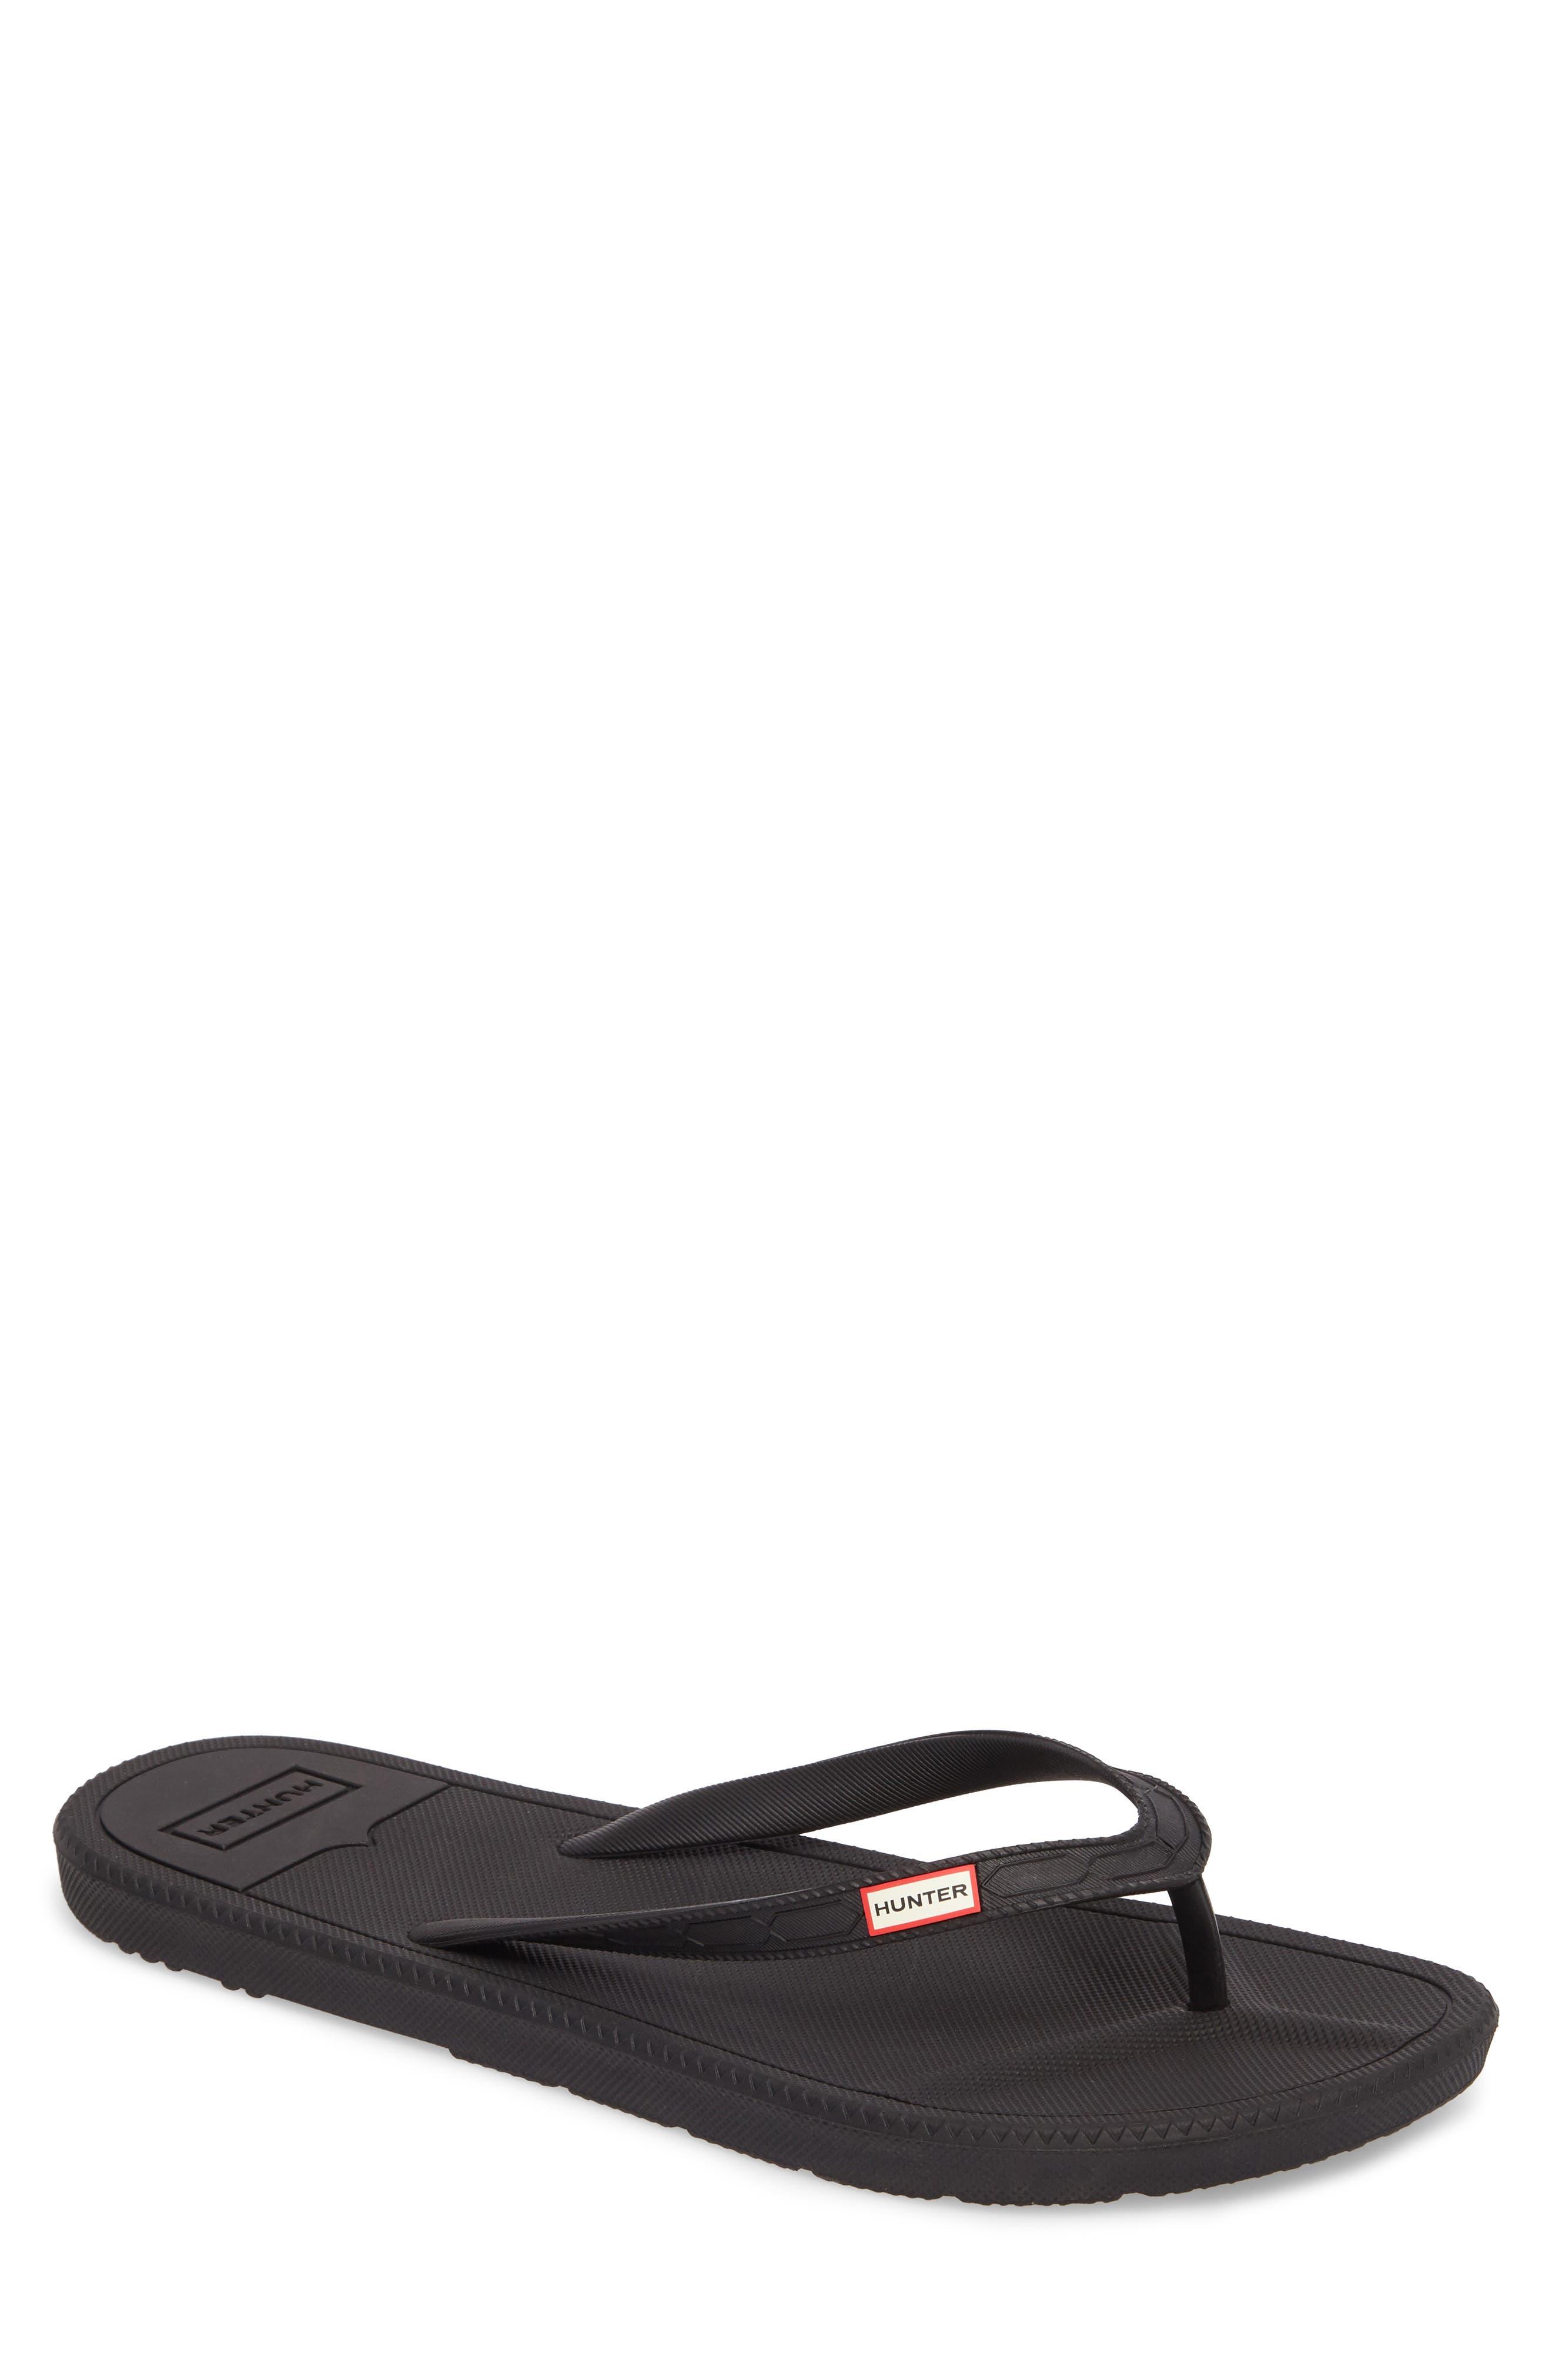 HUNTER Original Flip-Flop, Main, color, BLACK